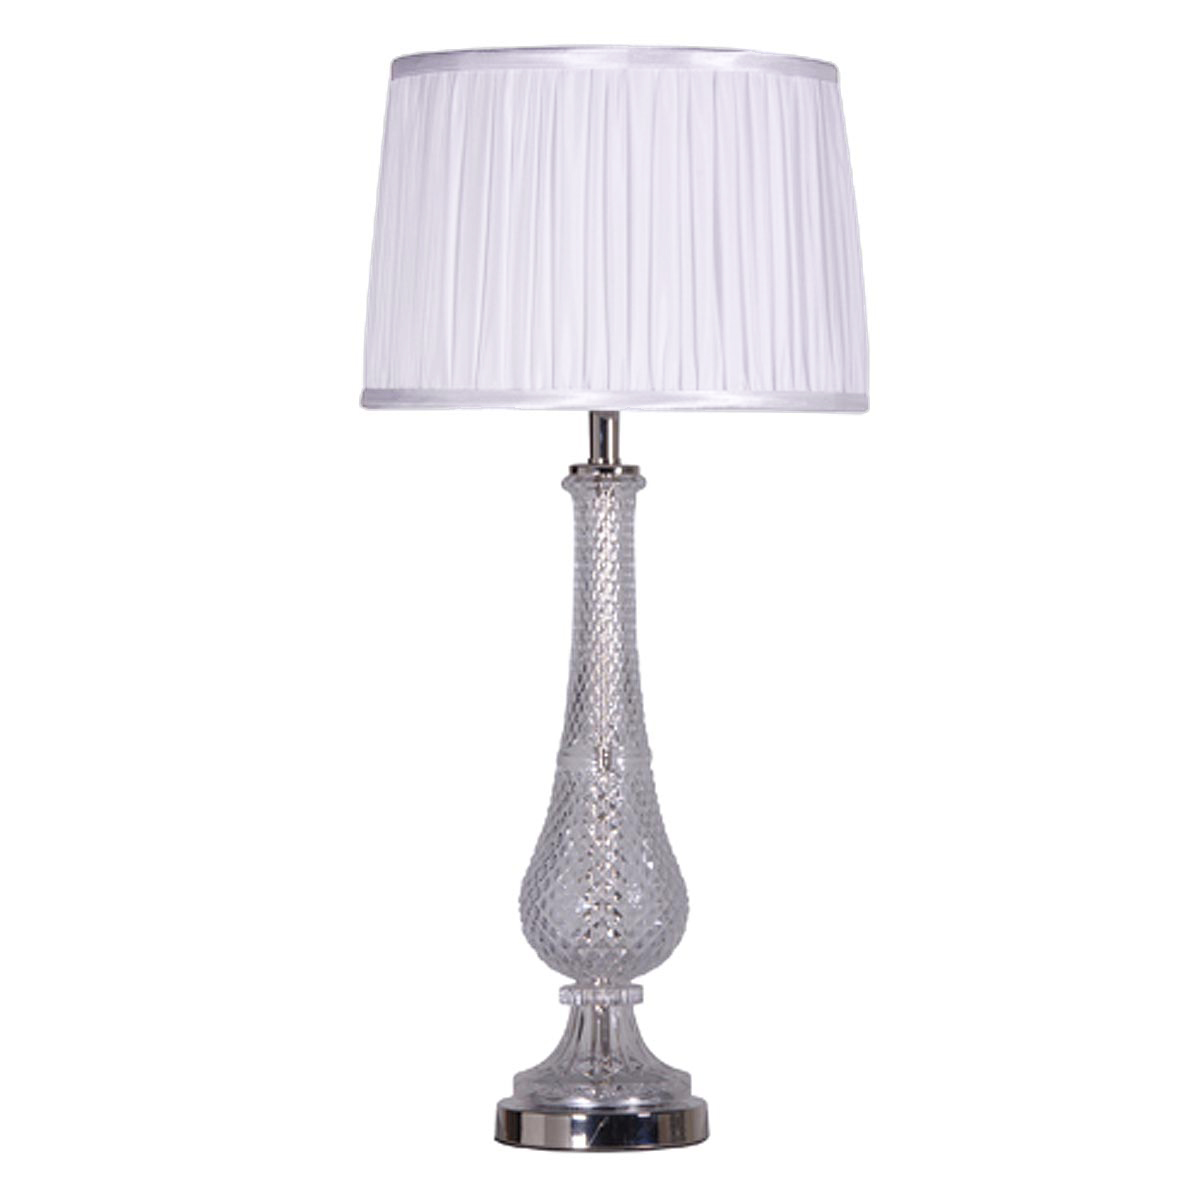 bedroom lighting lamp photo - 3